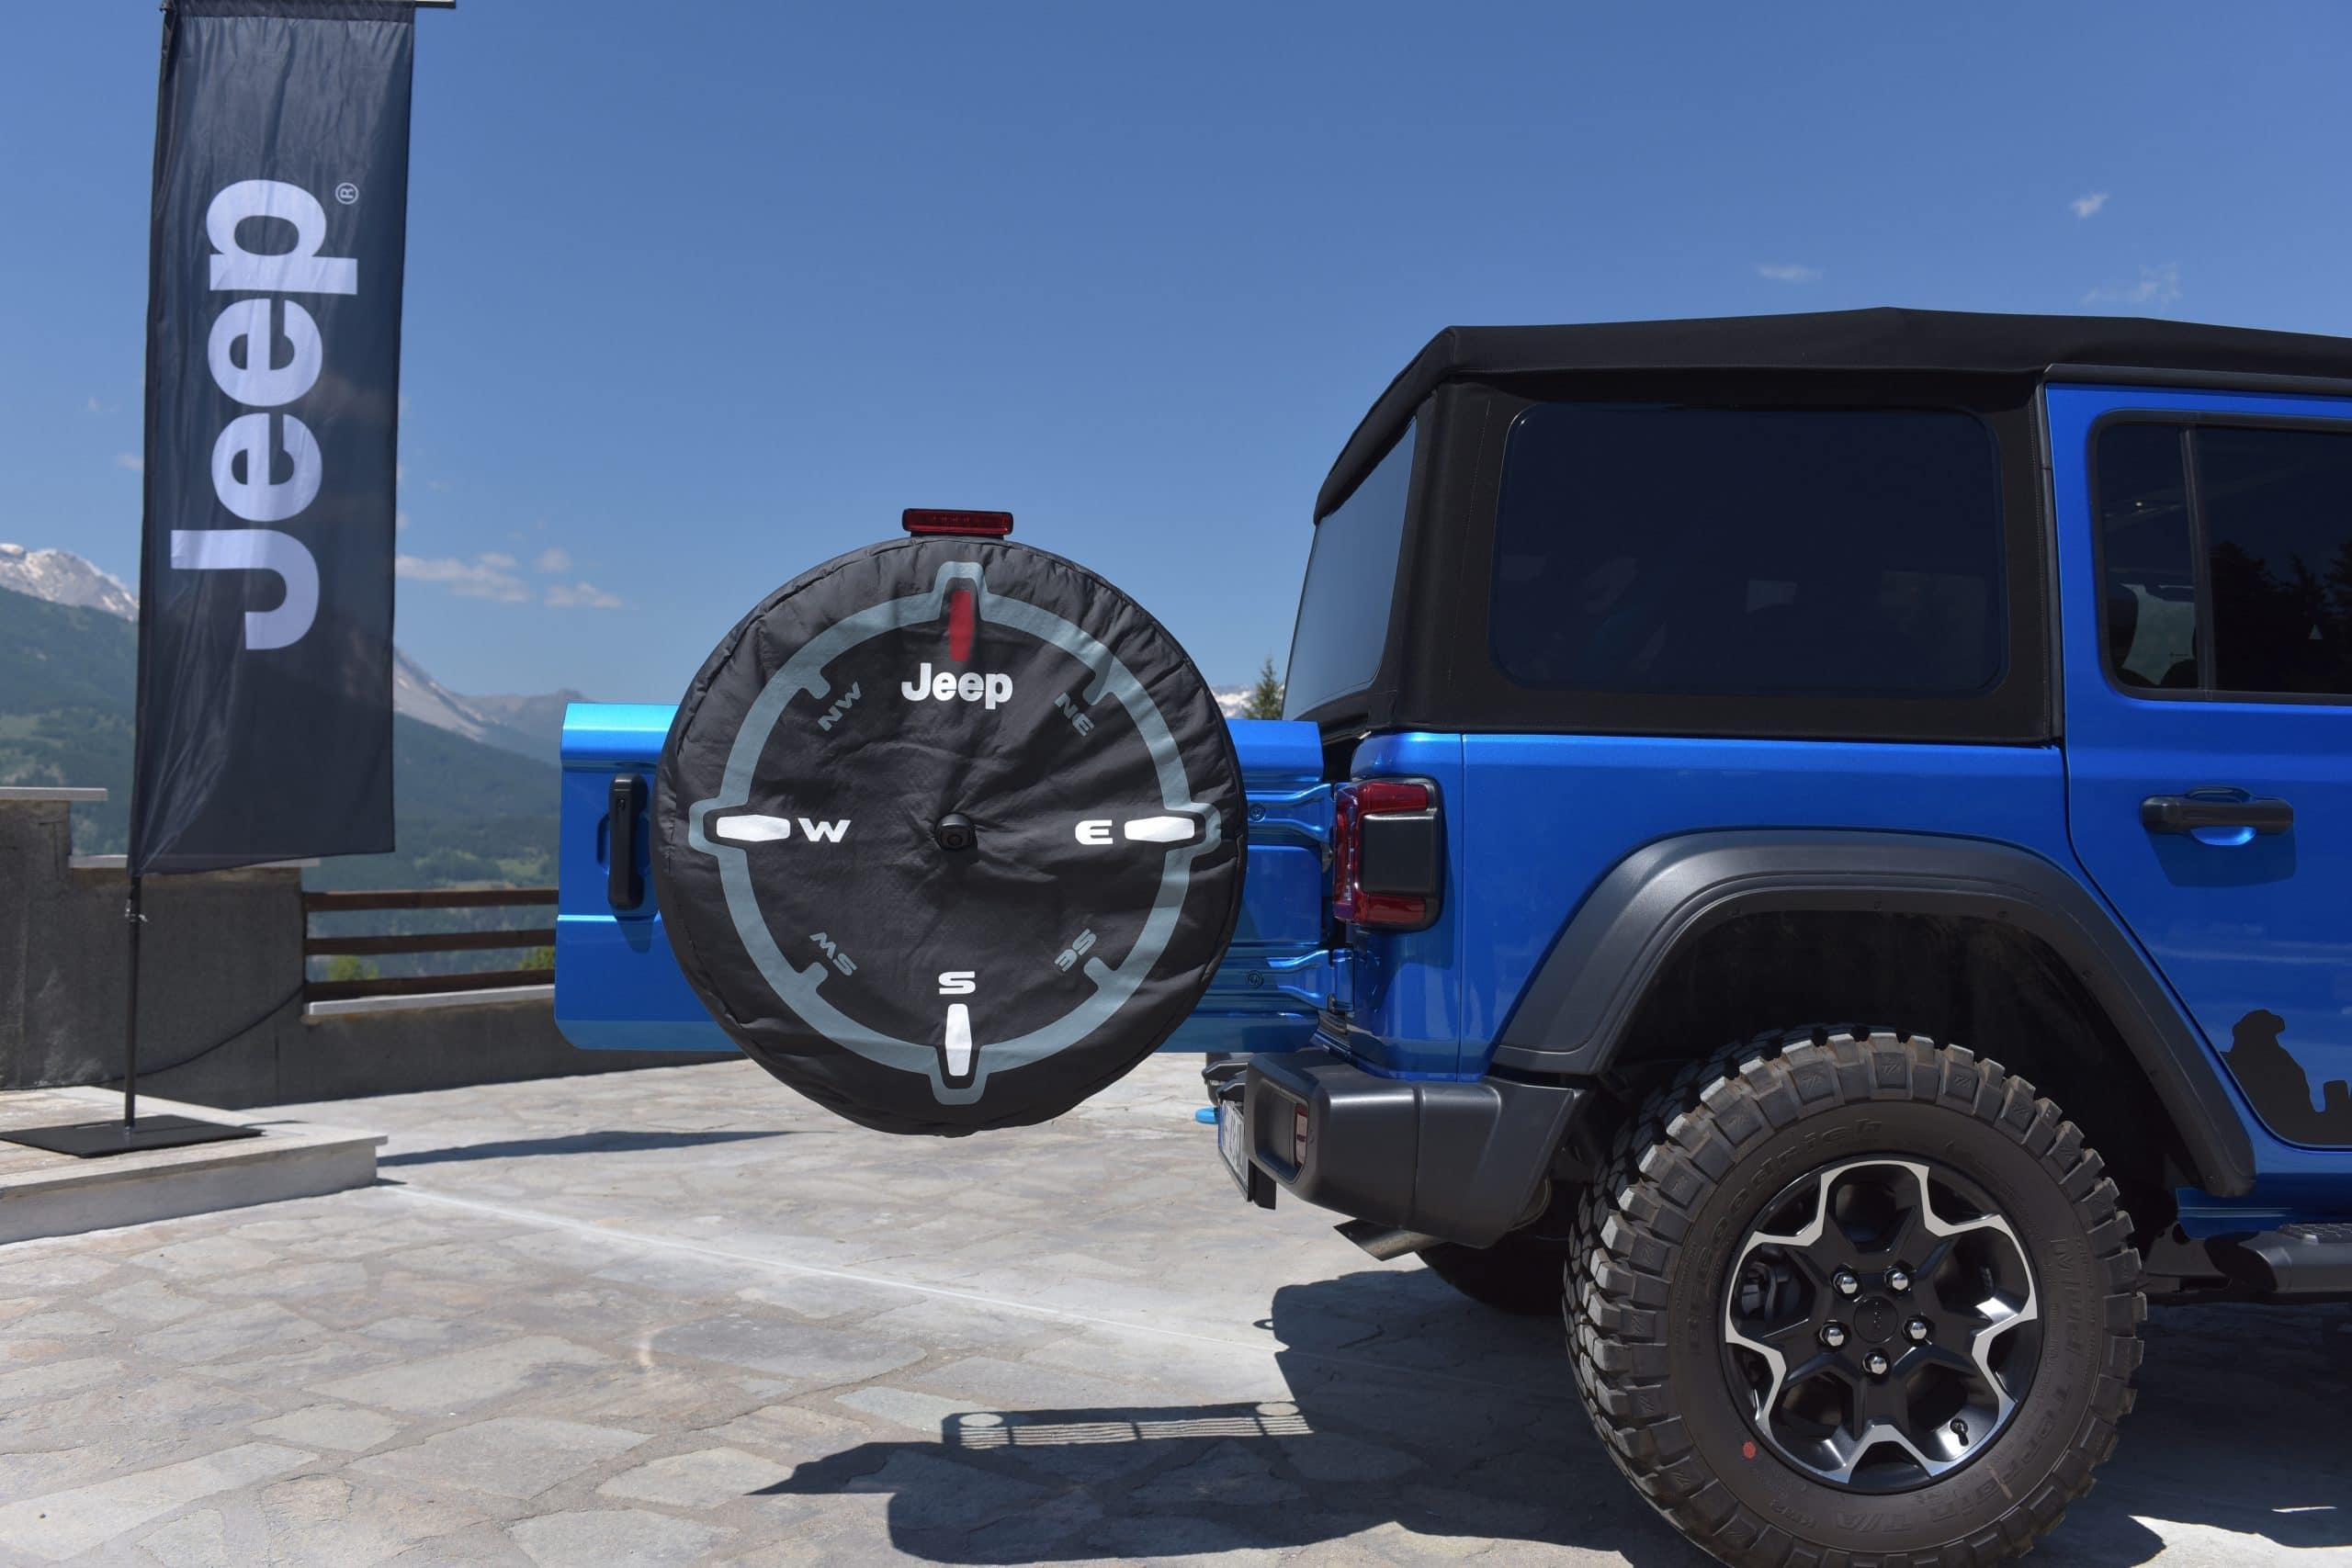 04 Jeep Wrangler 4xe scaled Νέα σειρά αξεσουάρ για το Plug-in Hybrid, Jeep Wrangler 4xe Jeep, Jeep 4XE, Mopar, Wrangler, Wrangler 4XE, ειδήσεις, Νέα